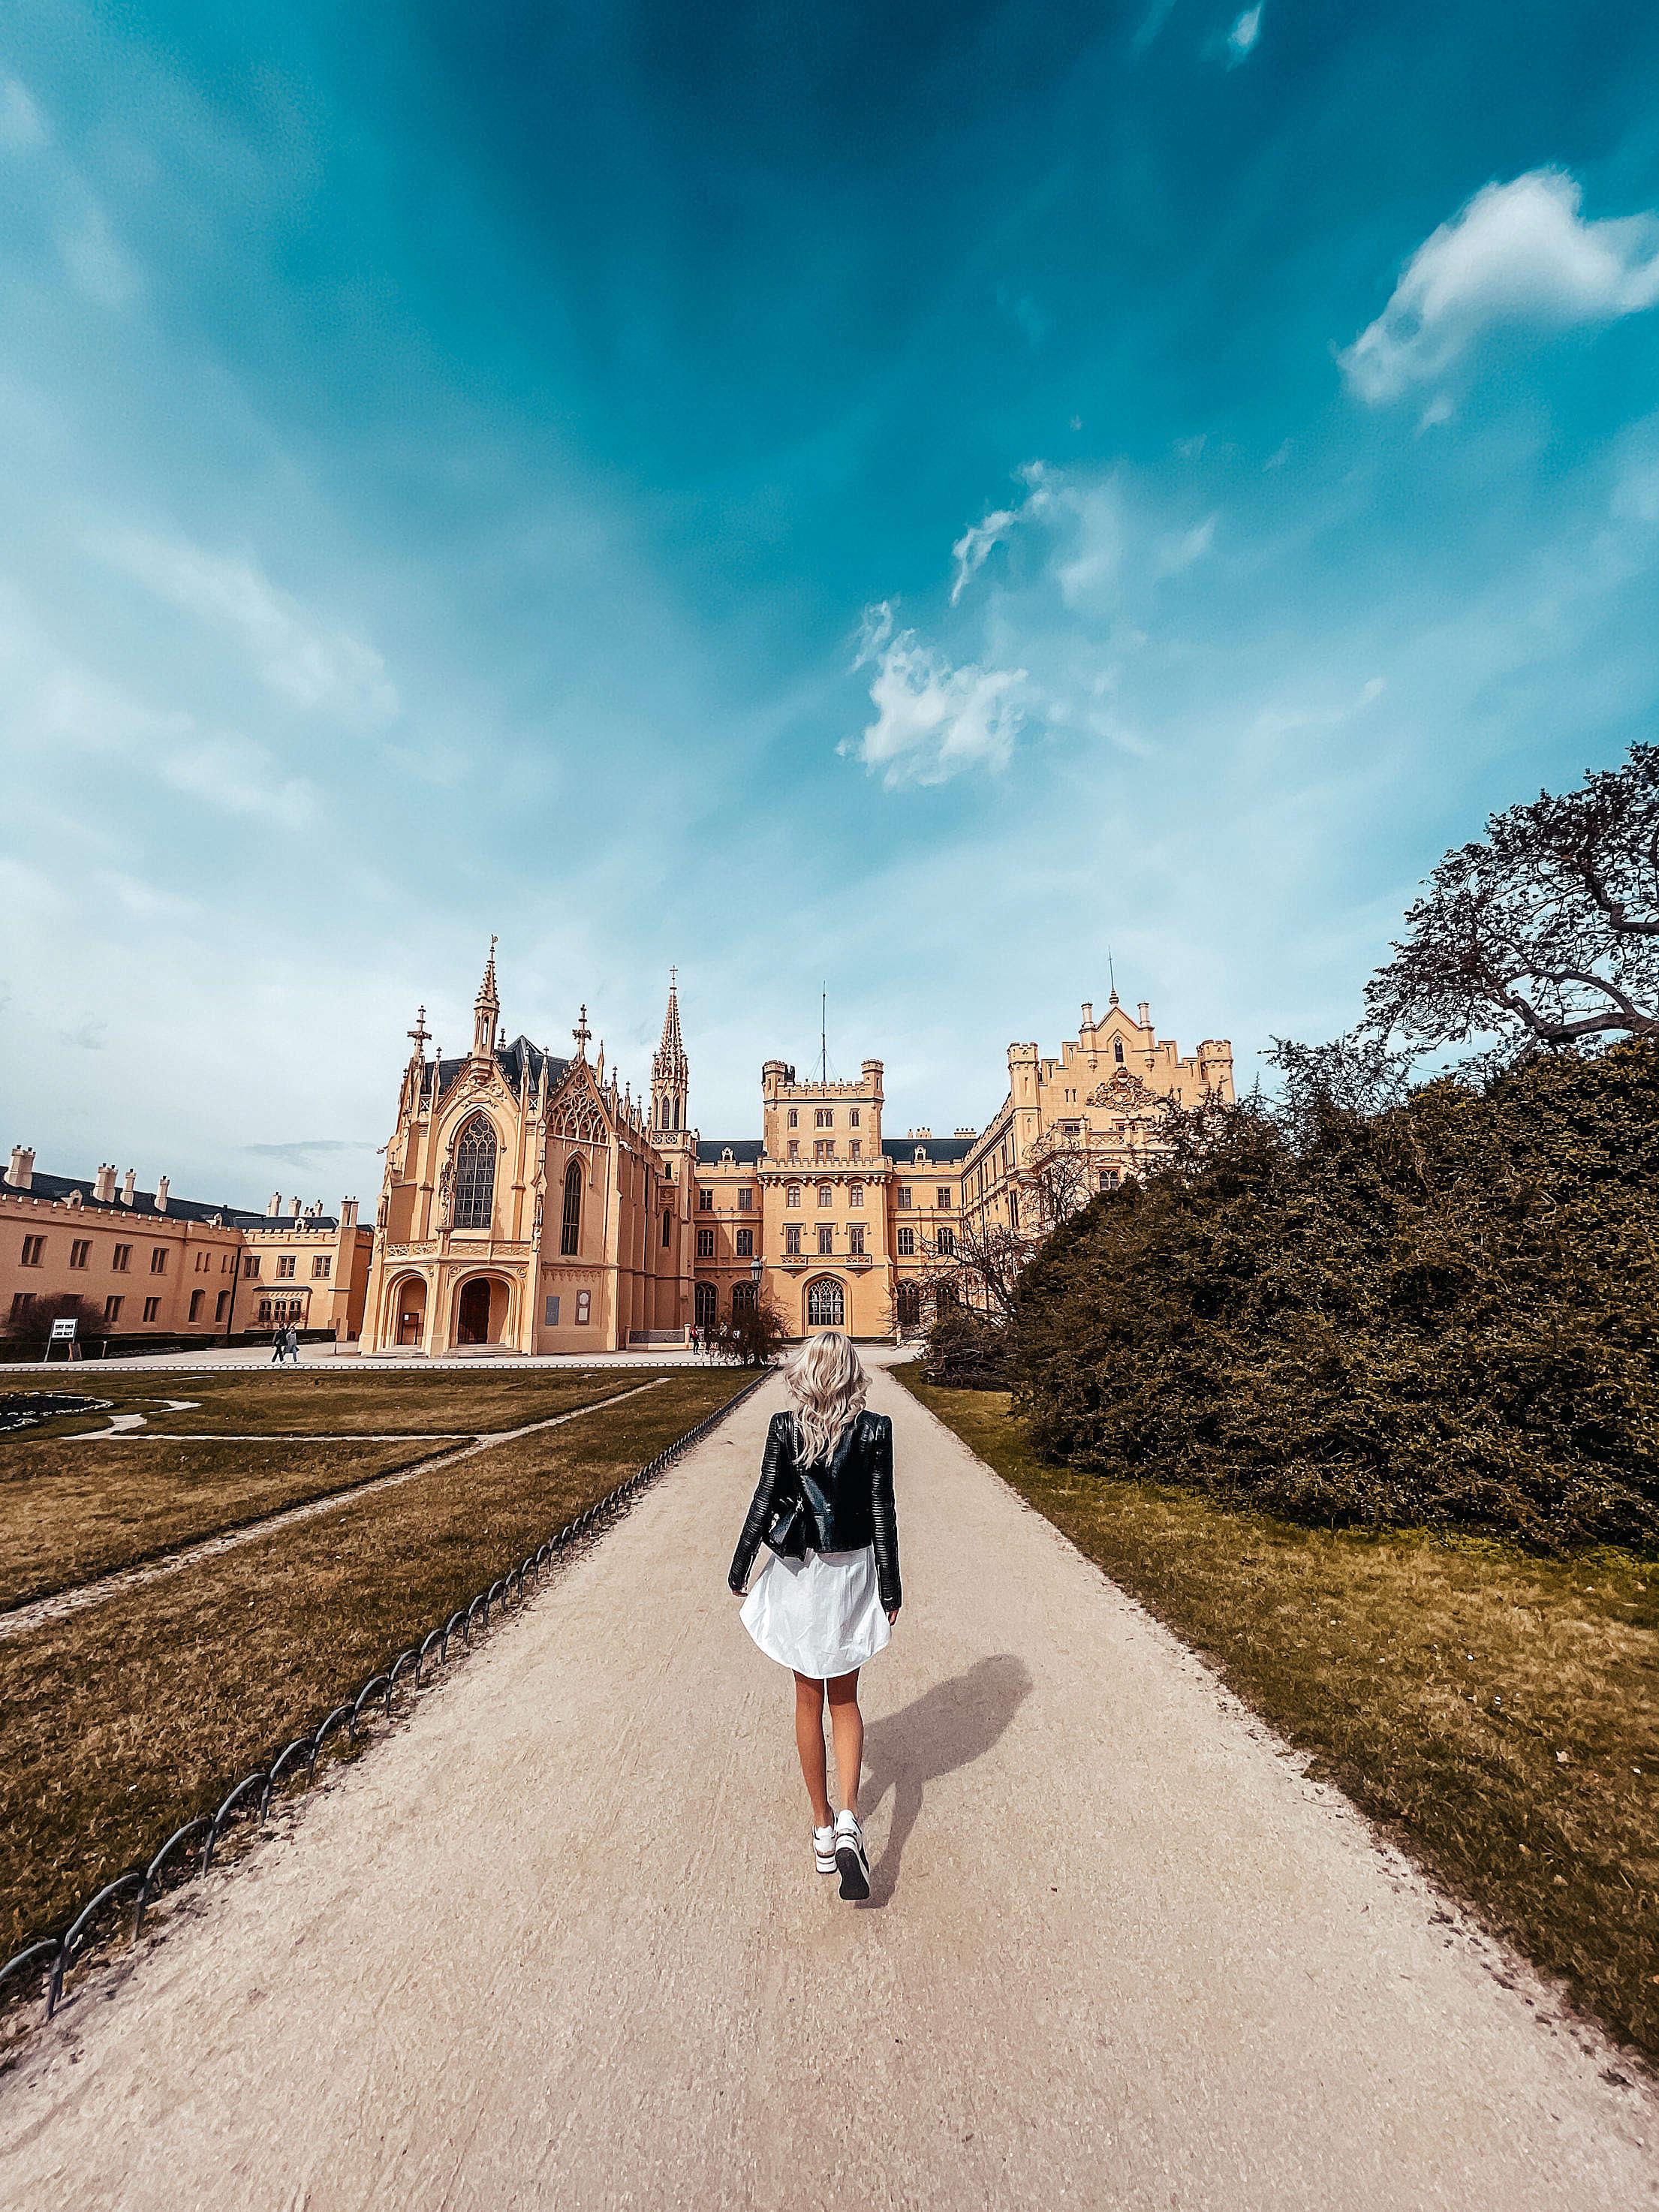 Woman Walking in Lednice Park to Visit Lednice Castle, Czechia Free Stock Photo